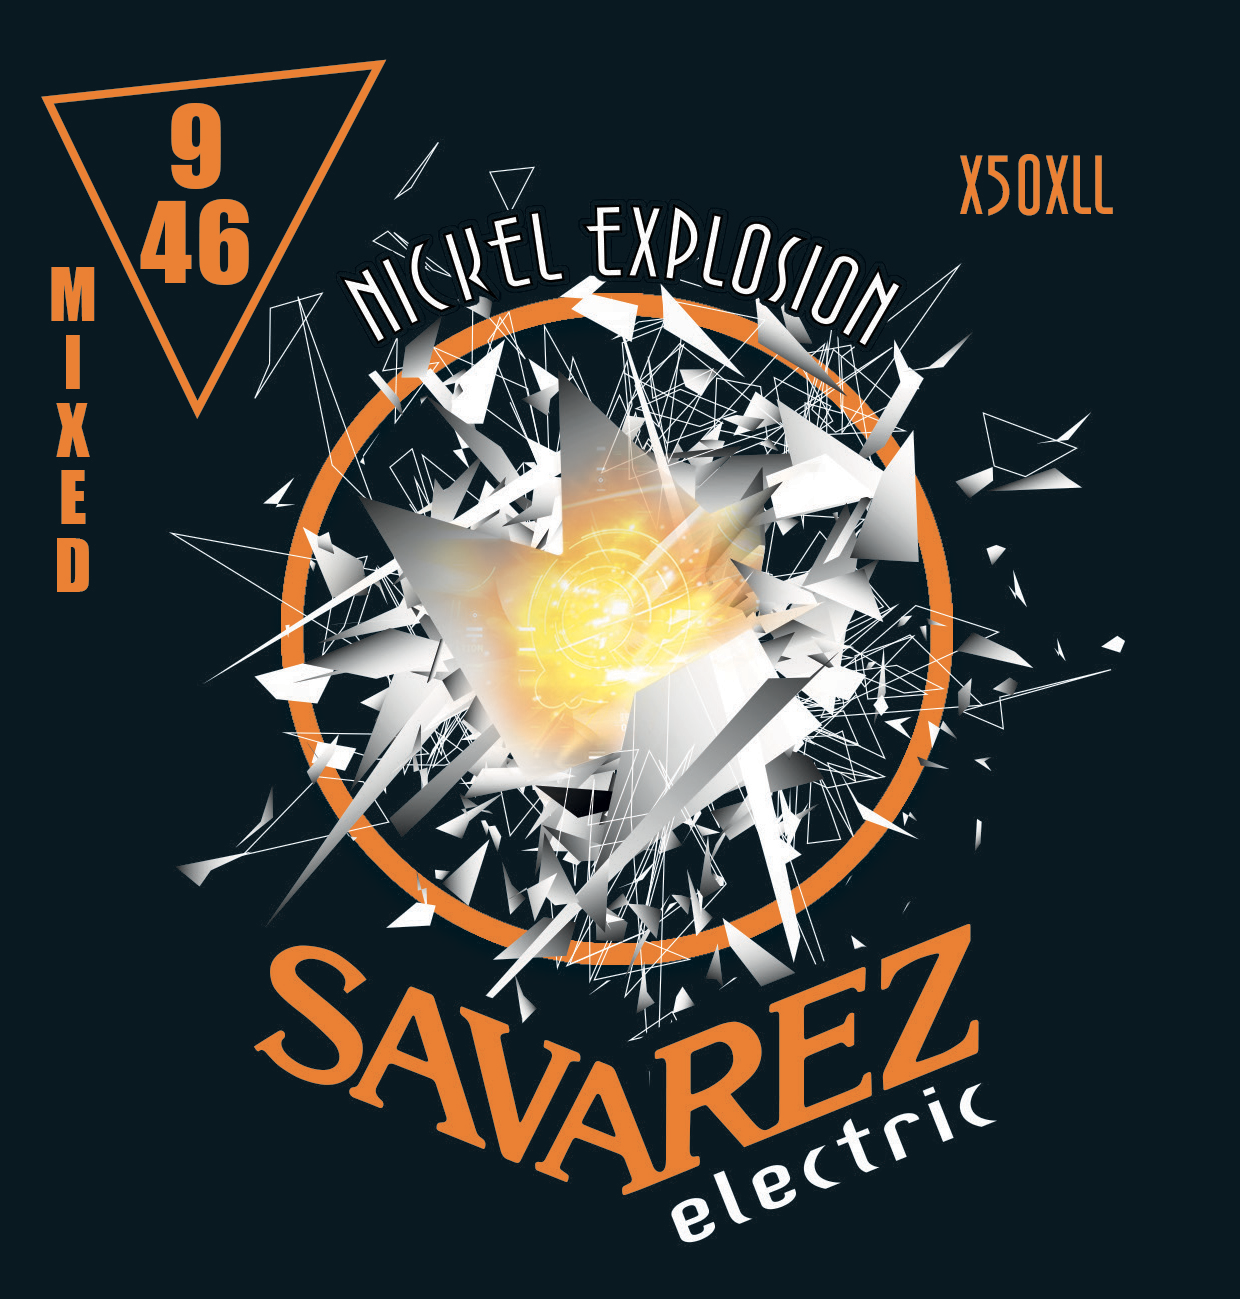 SAVAREZ ELECTRIC NICKEL EXPLOSION X50XLL